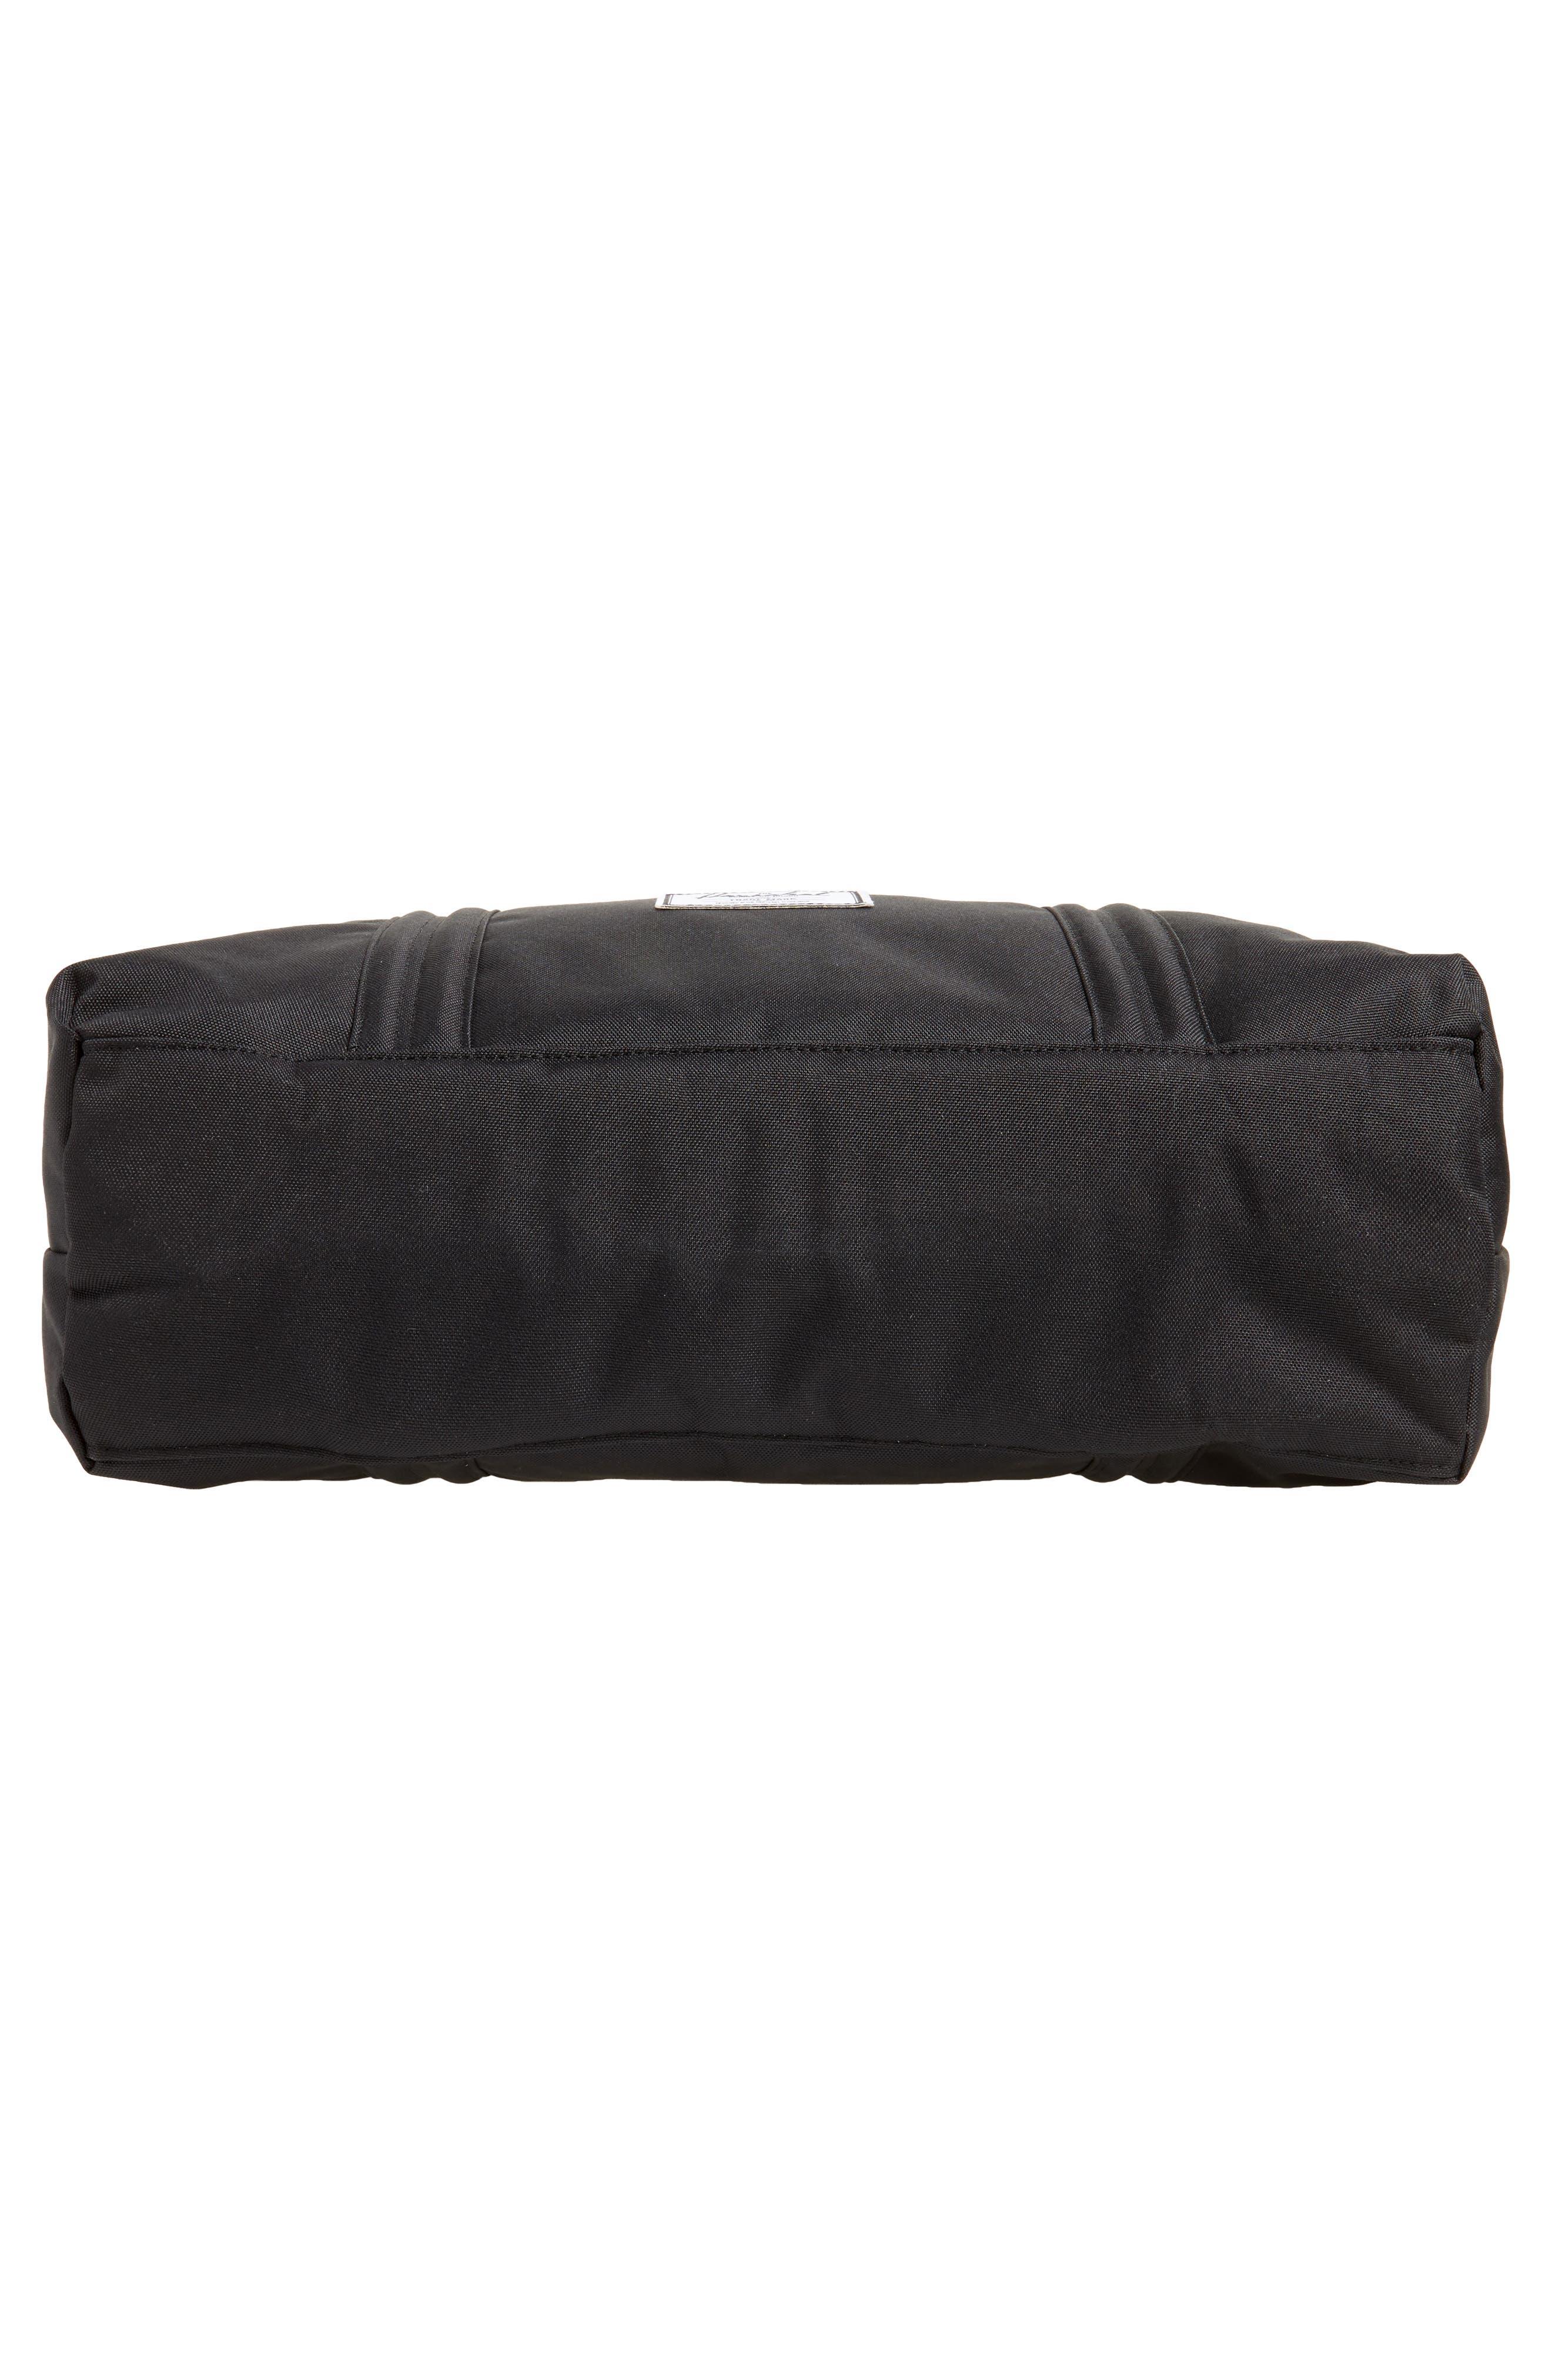 Sprout Diaper Bag,                             Alternate thumbnail 6, color,                             BLACK